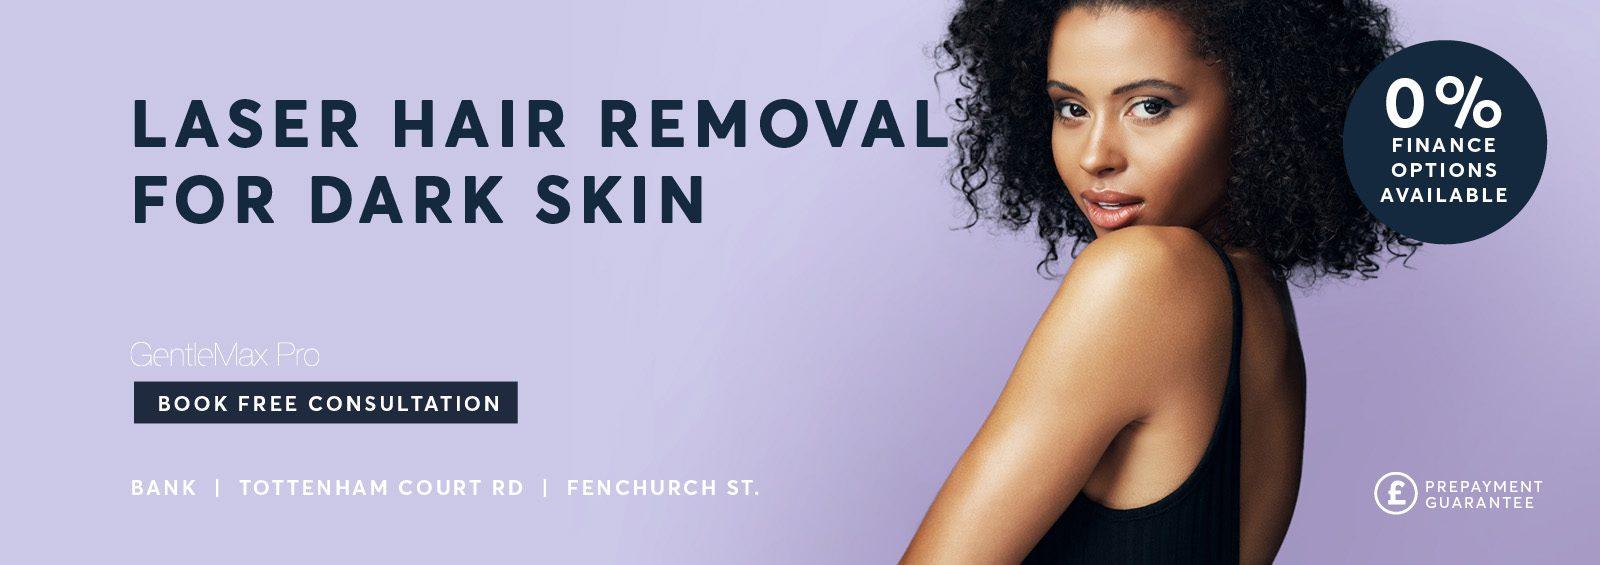 Laser Hair Removal Dark Skin type